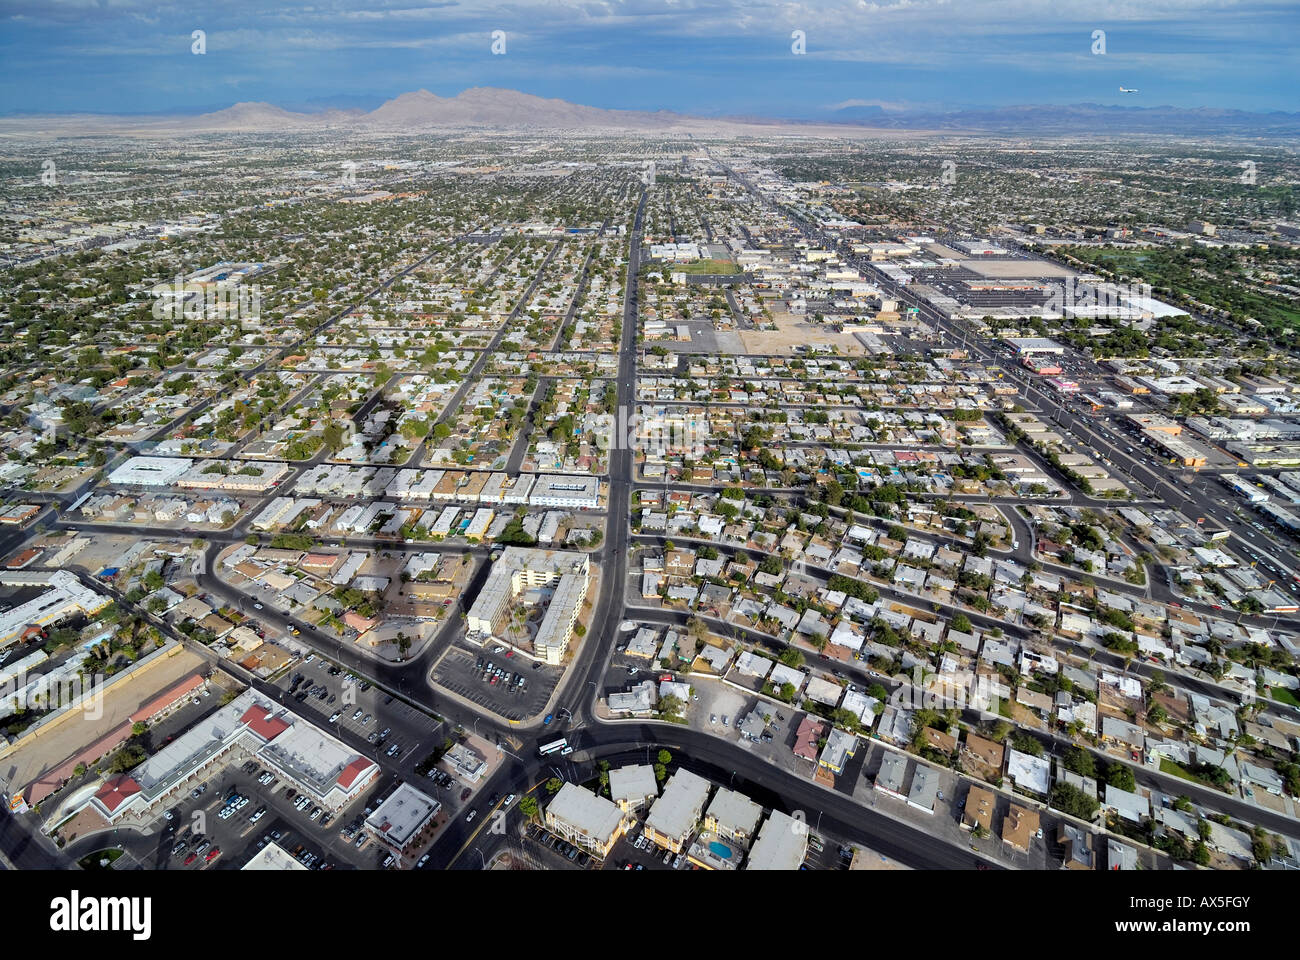 Residential area viewed from Stratosphere Tower, Las Vegas Boulevard, Las Vegas, Nevada, USA, North America - Stock Image